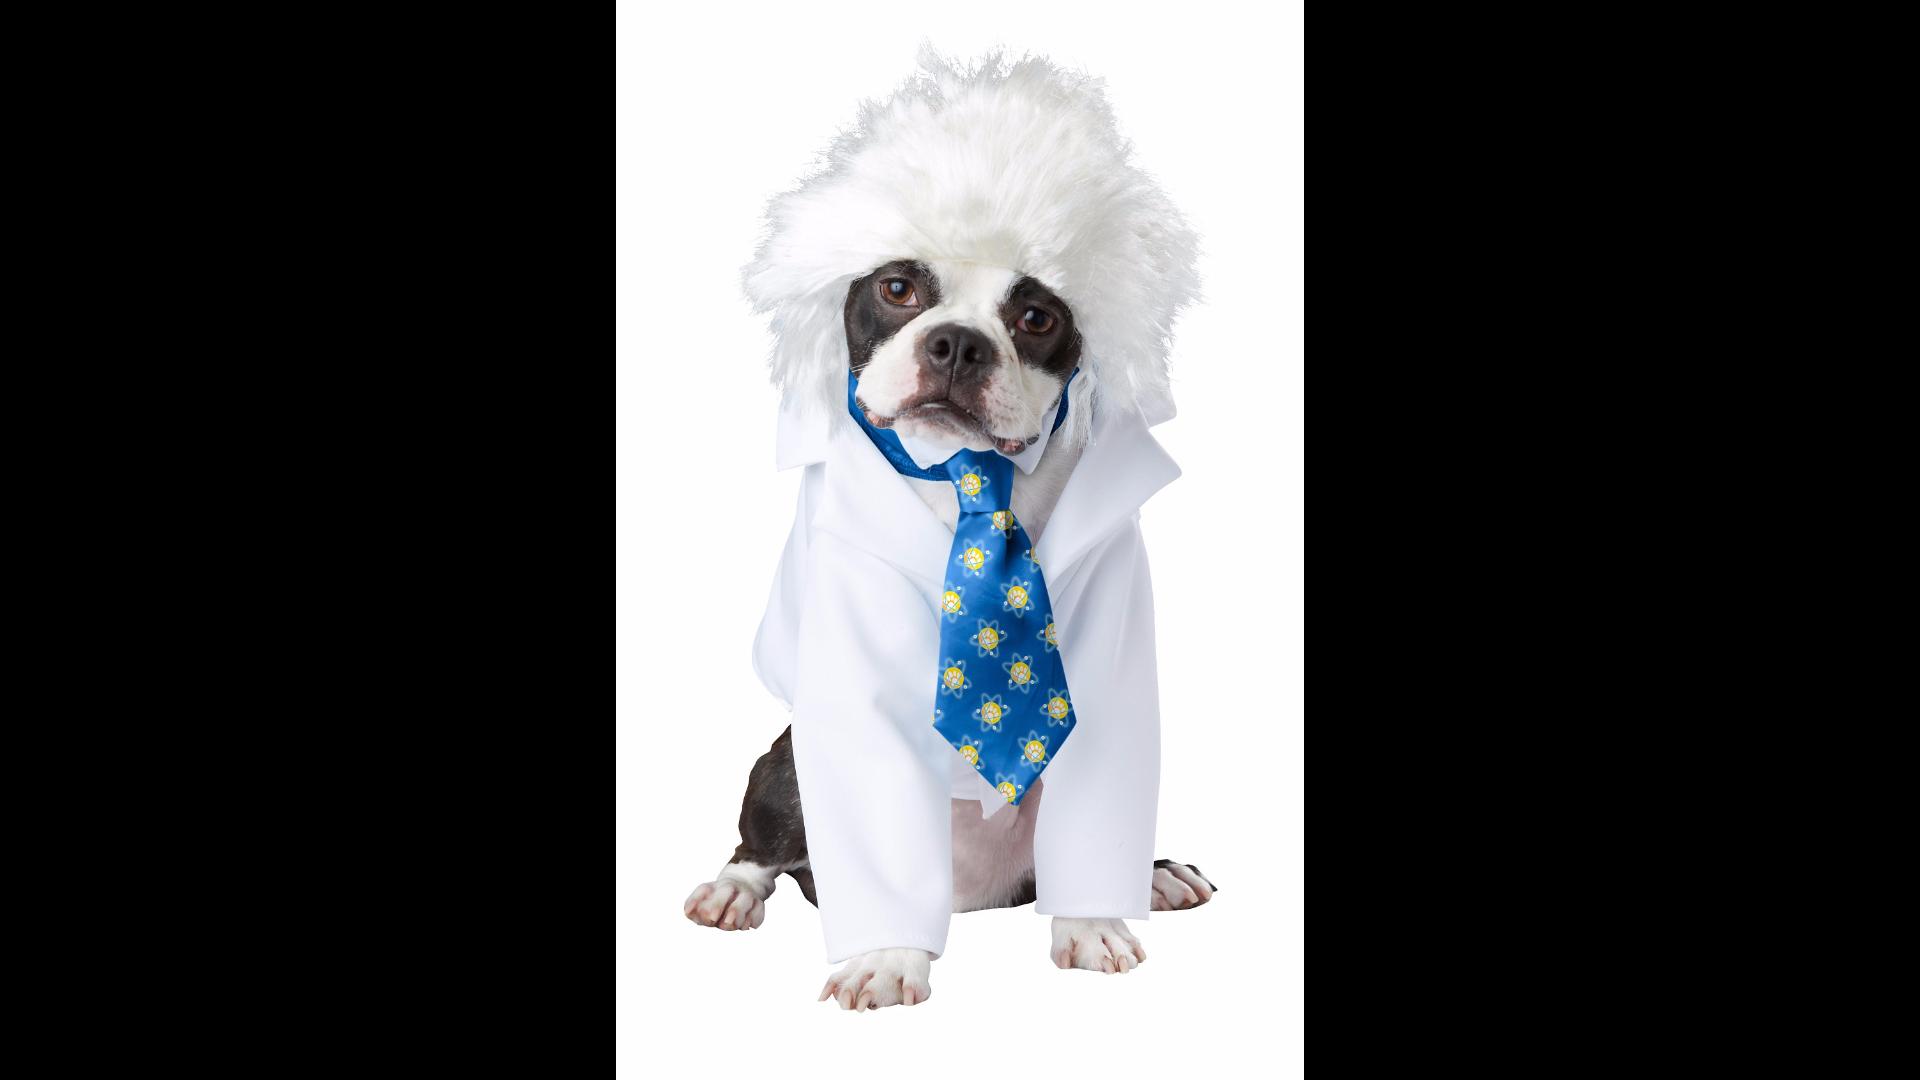 This genius Einstein costume for the thinking dog